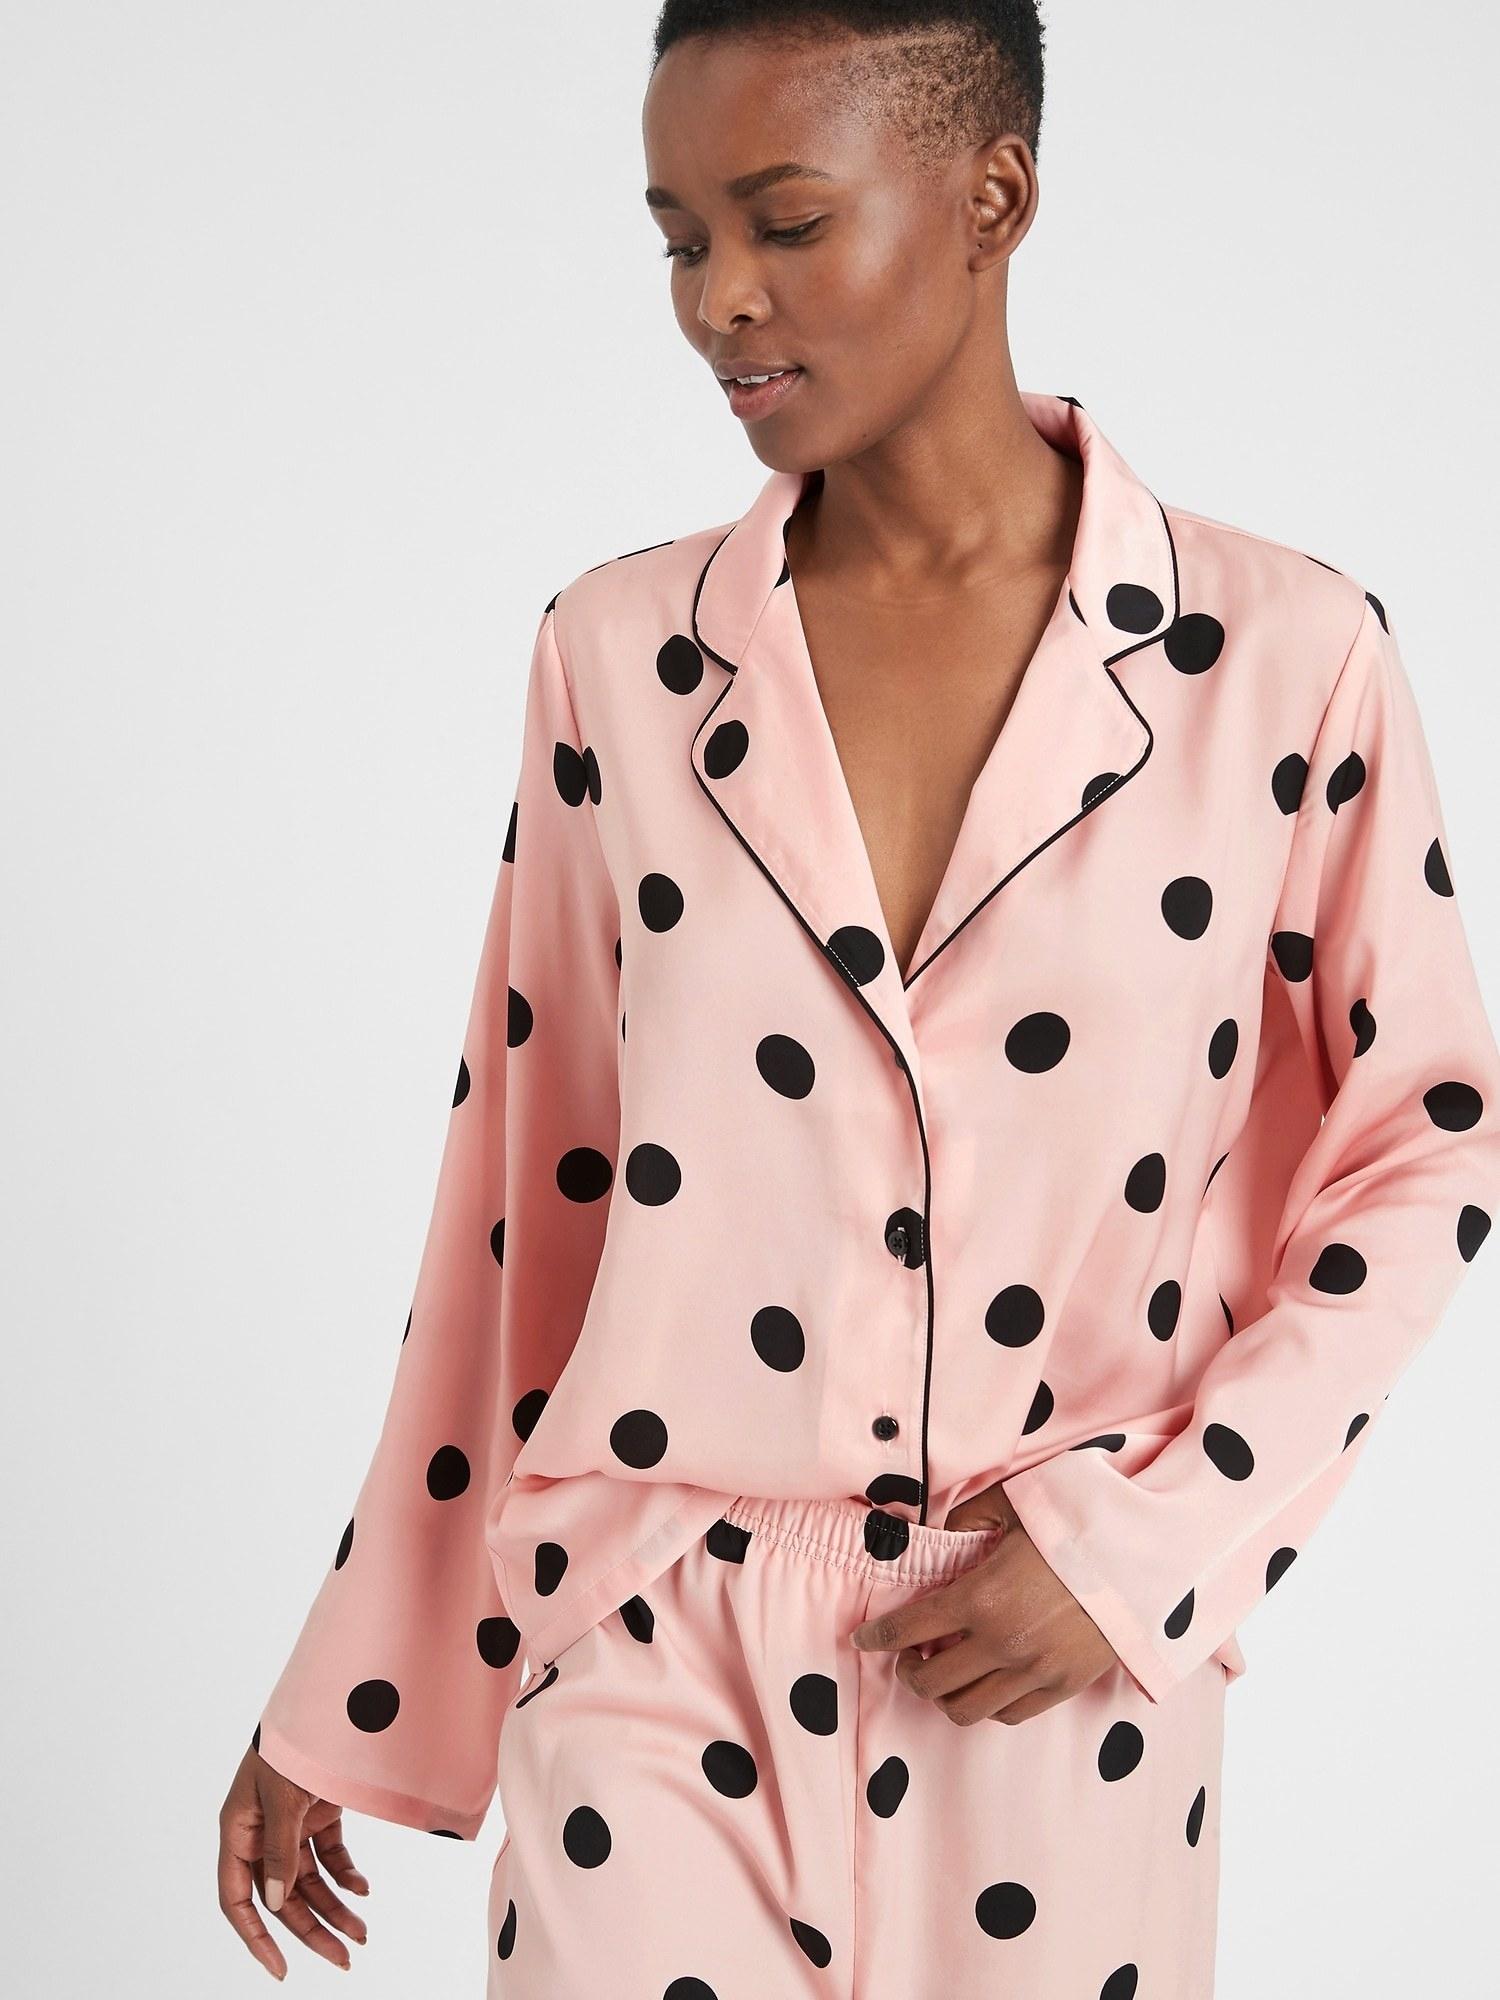 model wearing polka dot pajama top in pink